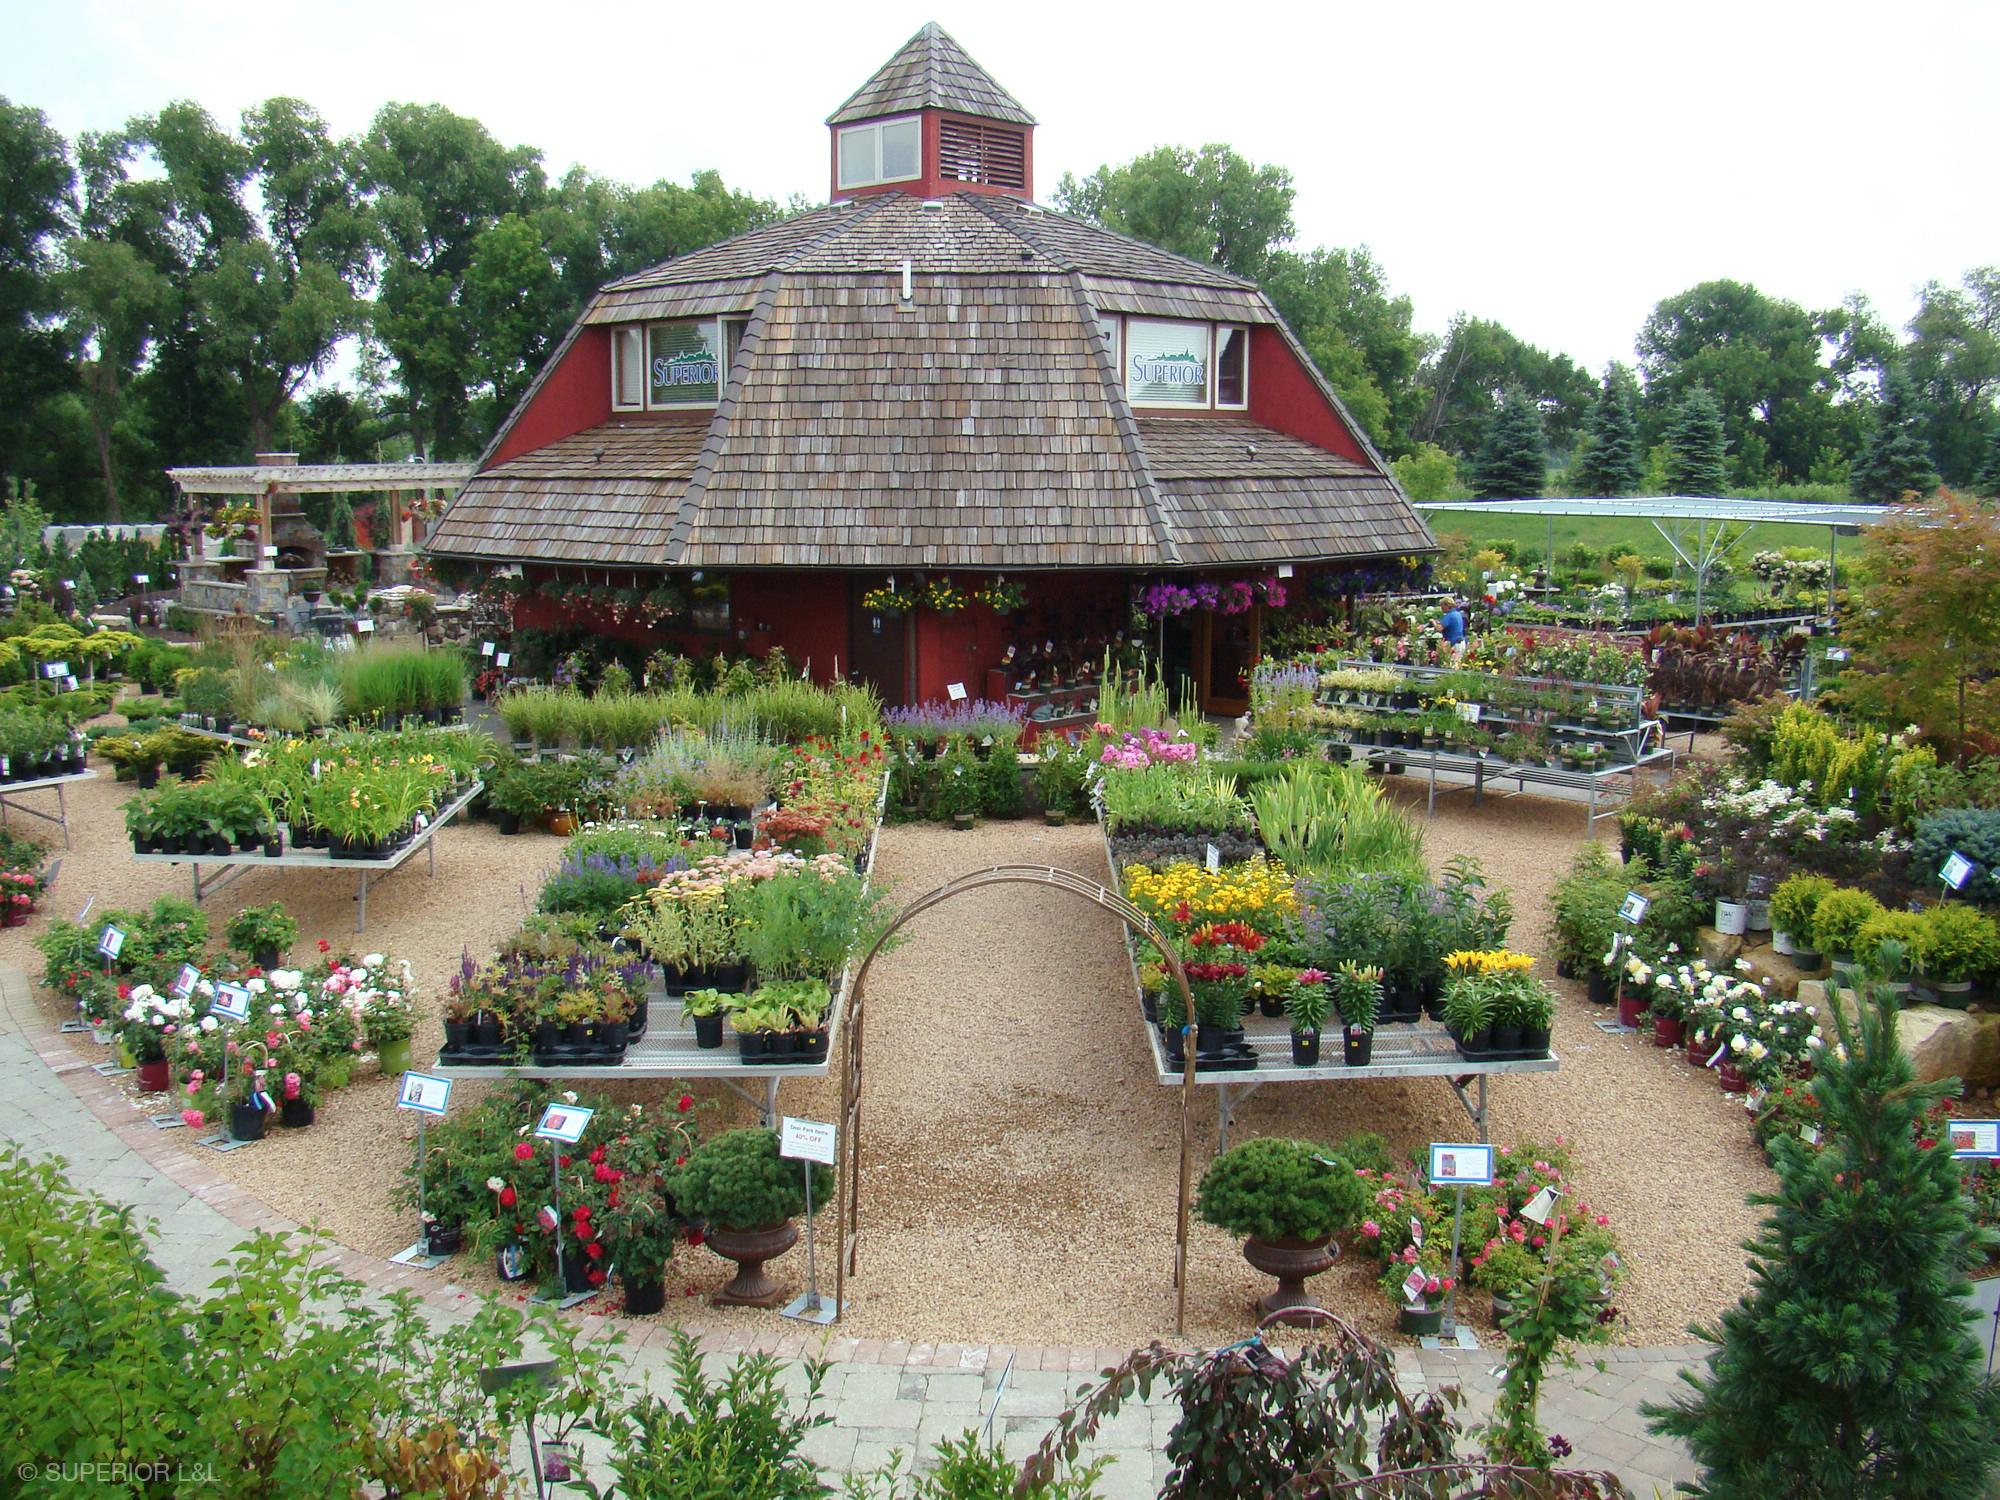 superior-ll-outdoor-expressions-garden-center-000.jpg